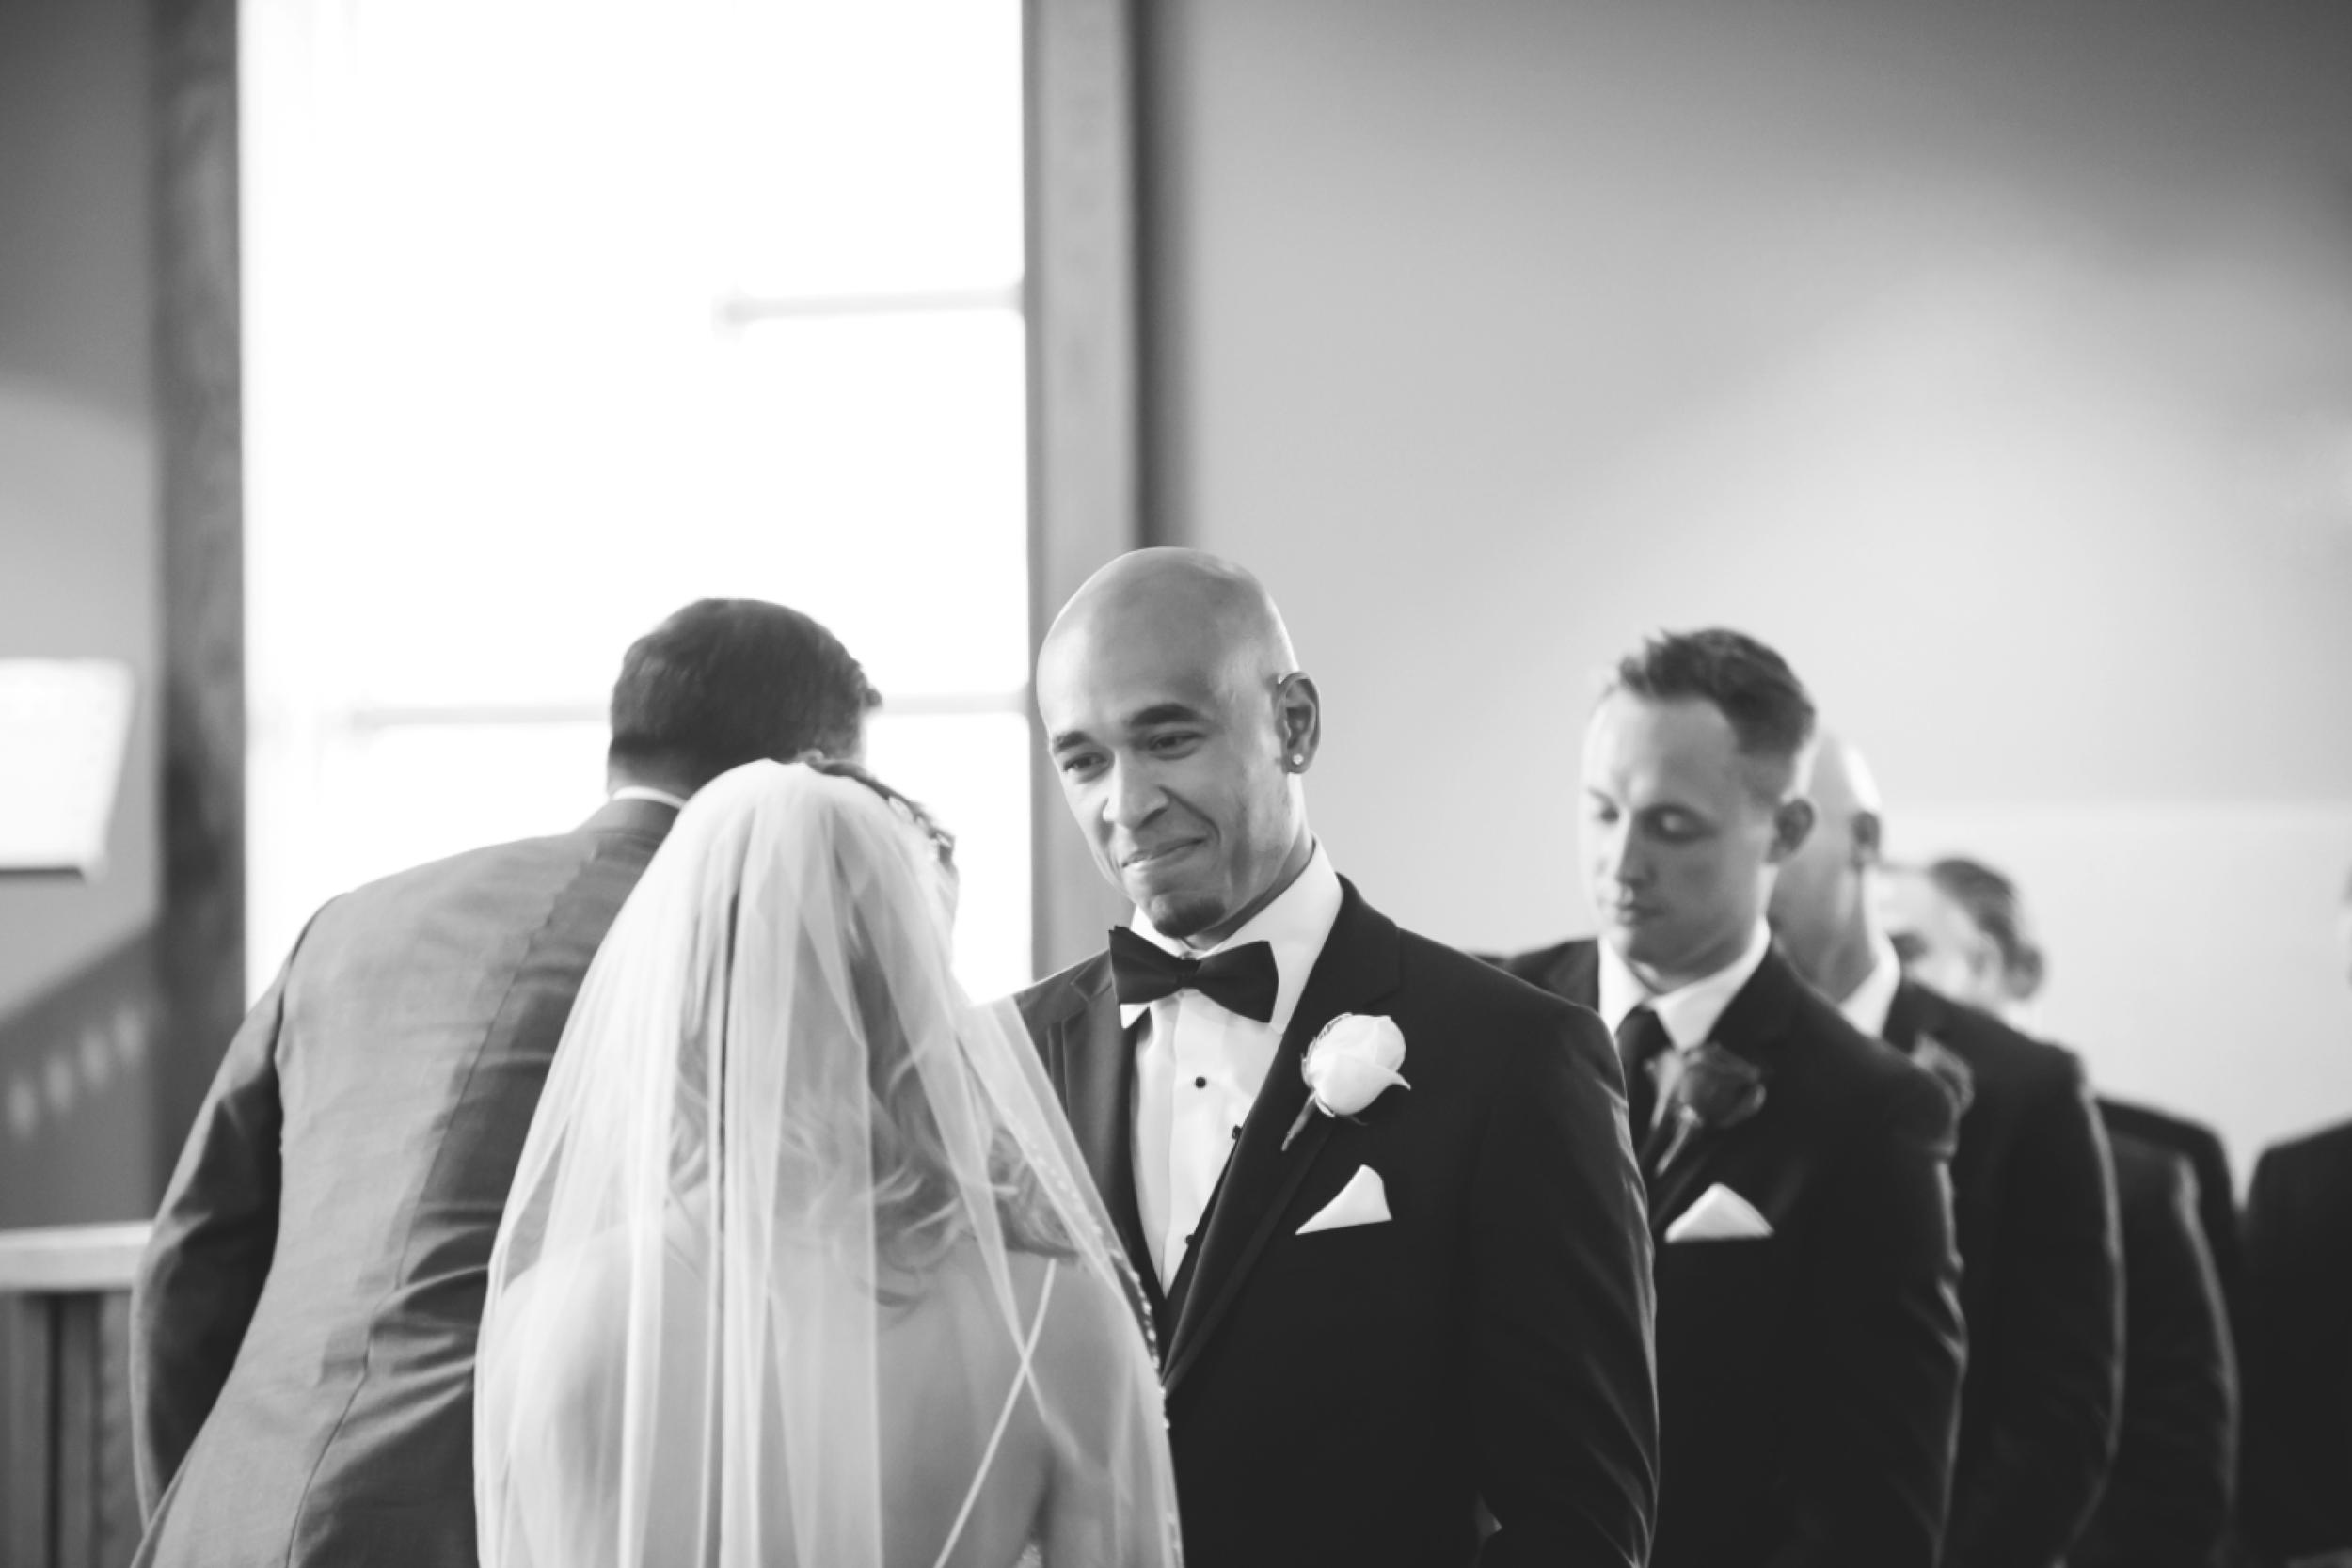 Wedding-Burlington-Convention-Center-Burlington-Oakville-Toronto-Hamilton-Niagara-Wedding-Photographer-Photography-Moments-by-Lauren-Photo-Image-19.png